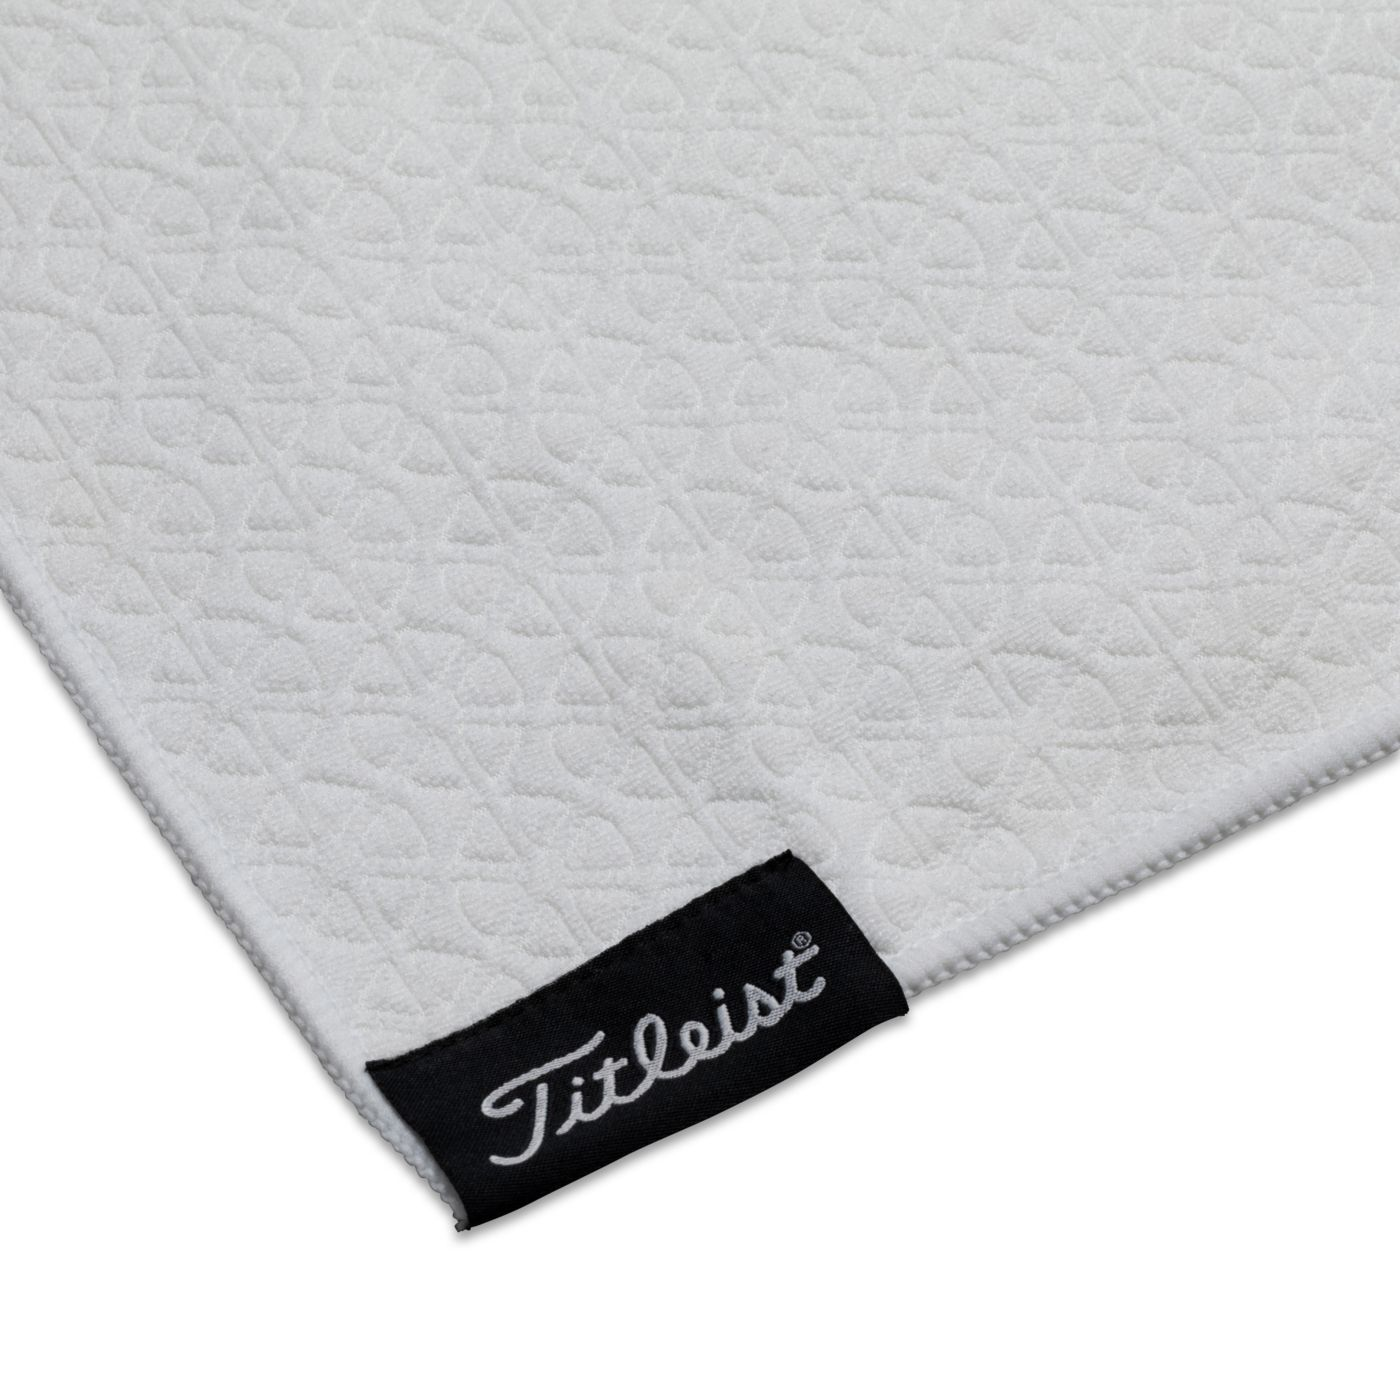 Titleist Players Microfiber Golf Towel